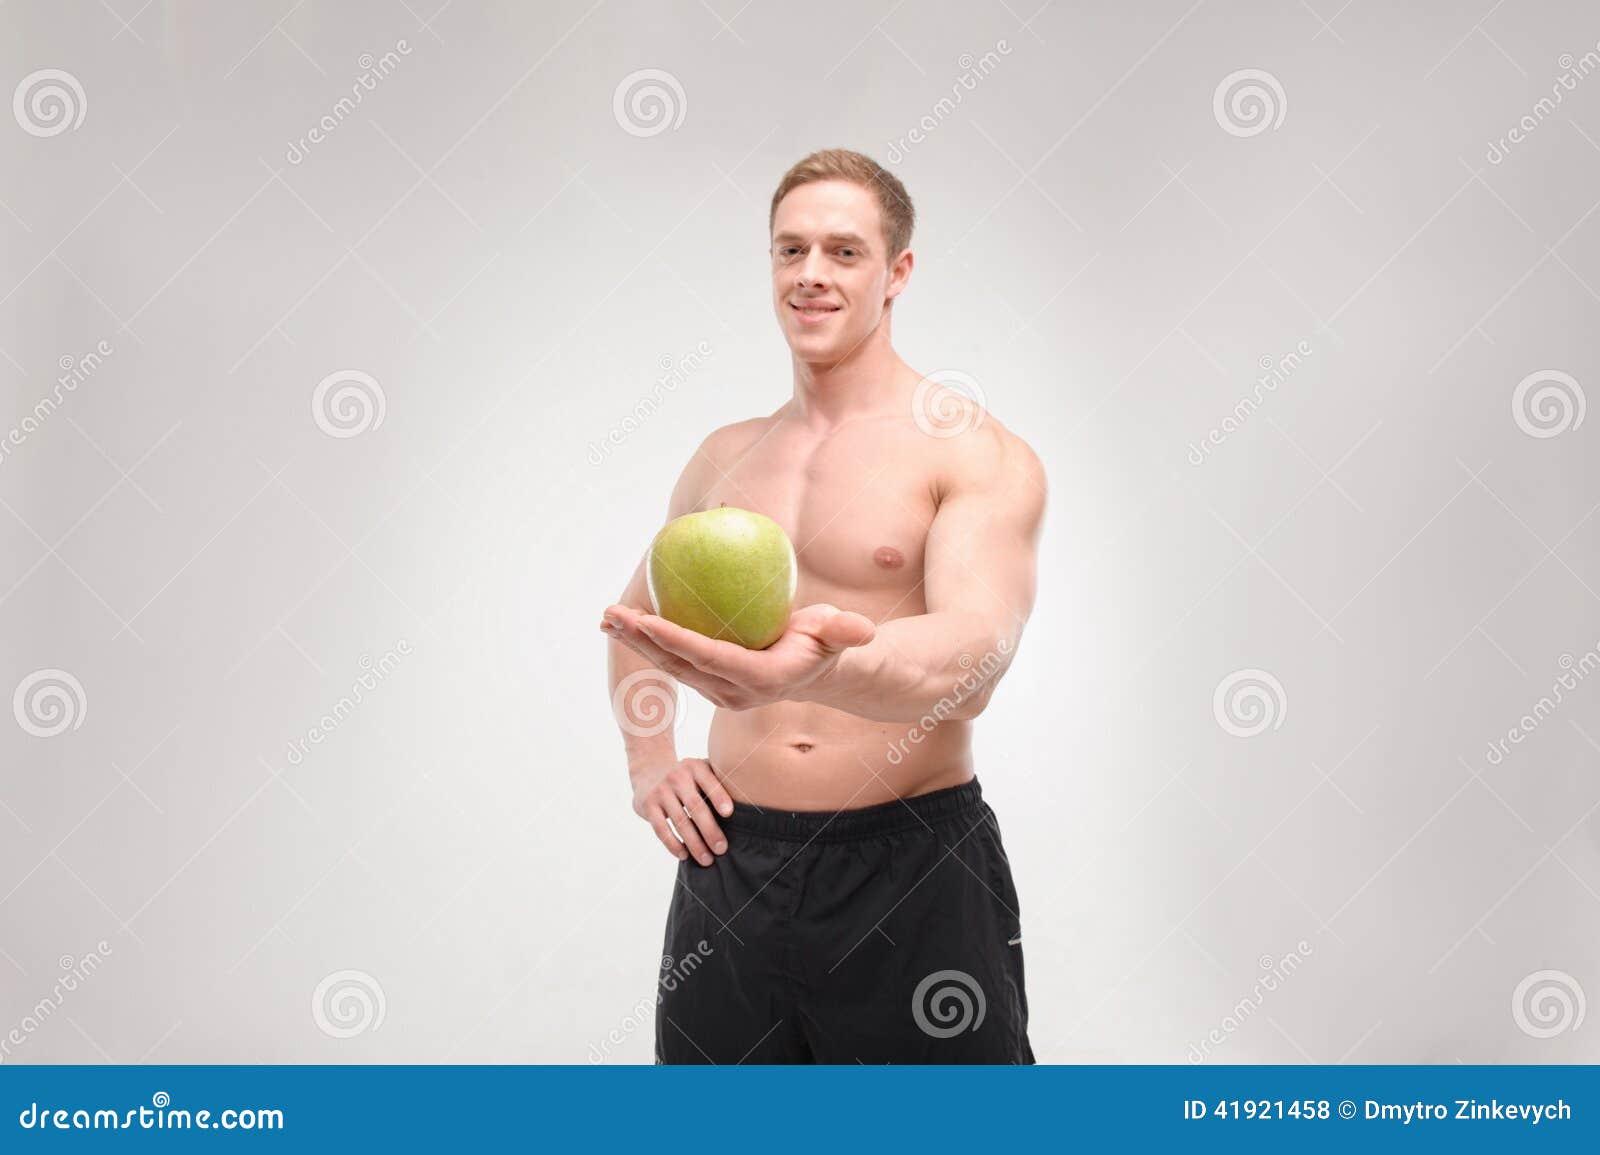 Atleta con una manzana